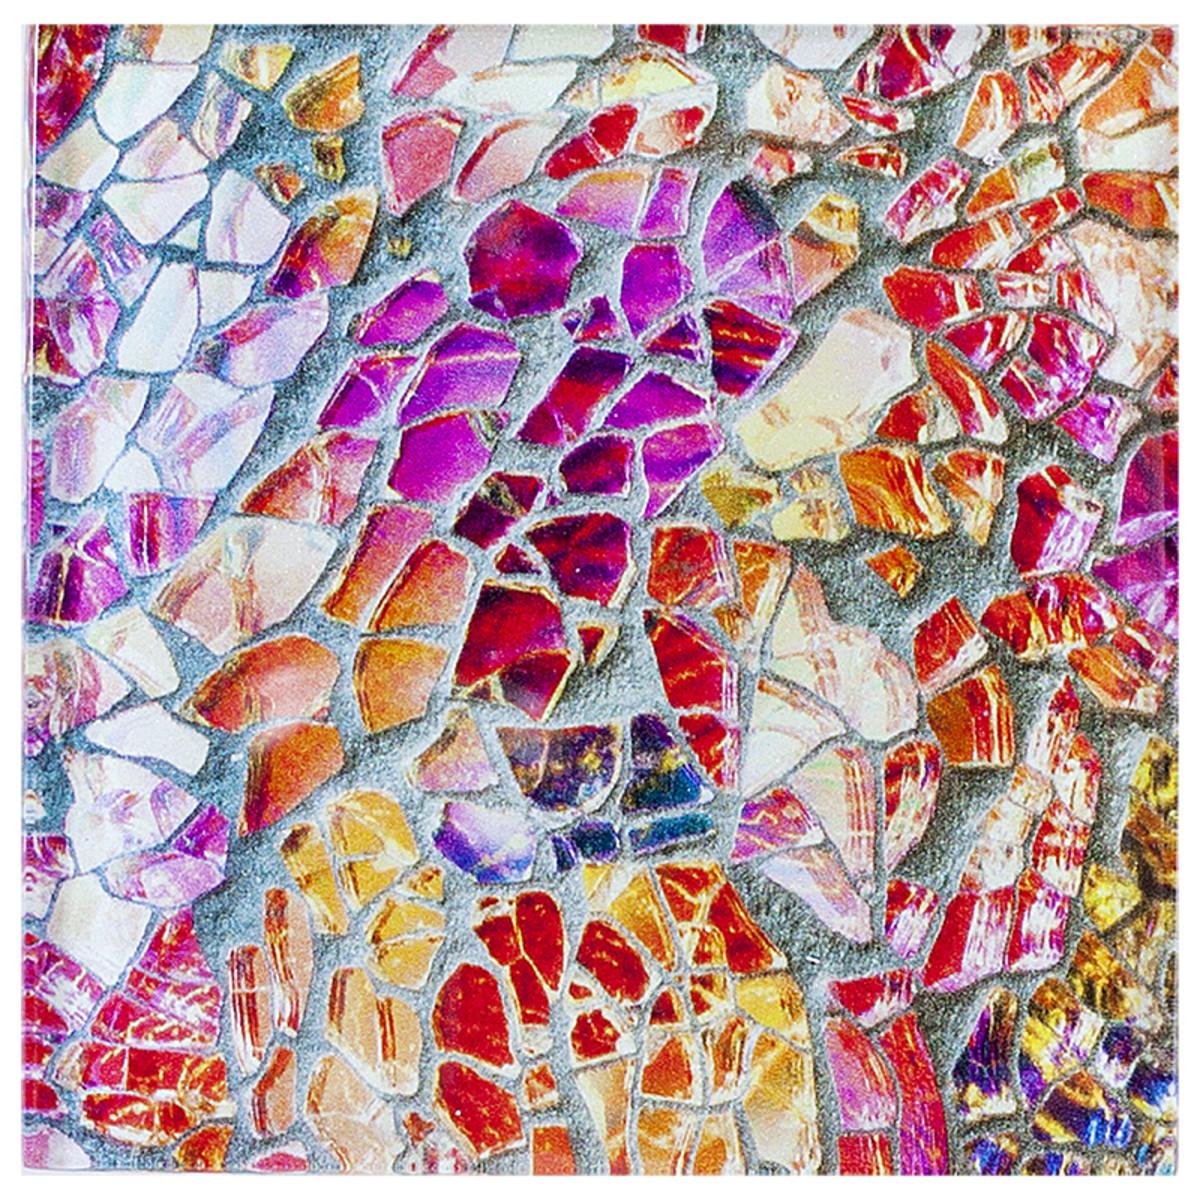 Abstraction mosaic 10x10 см